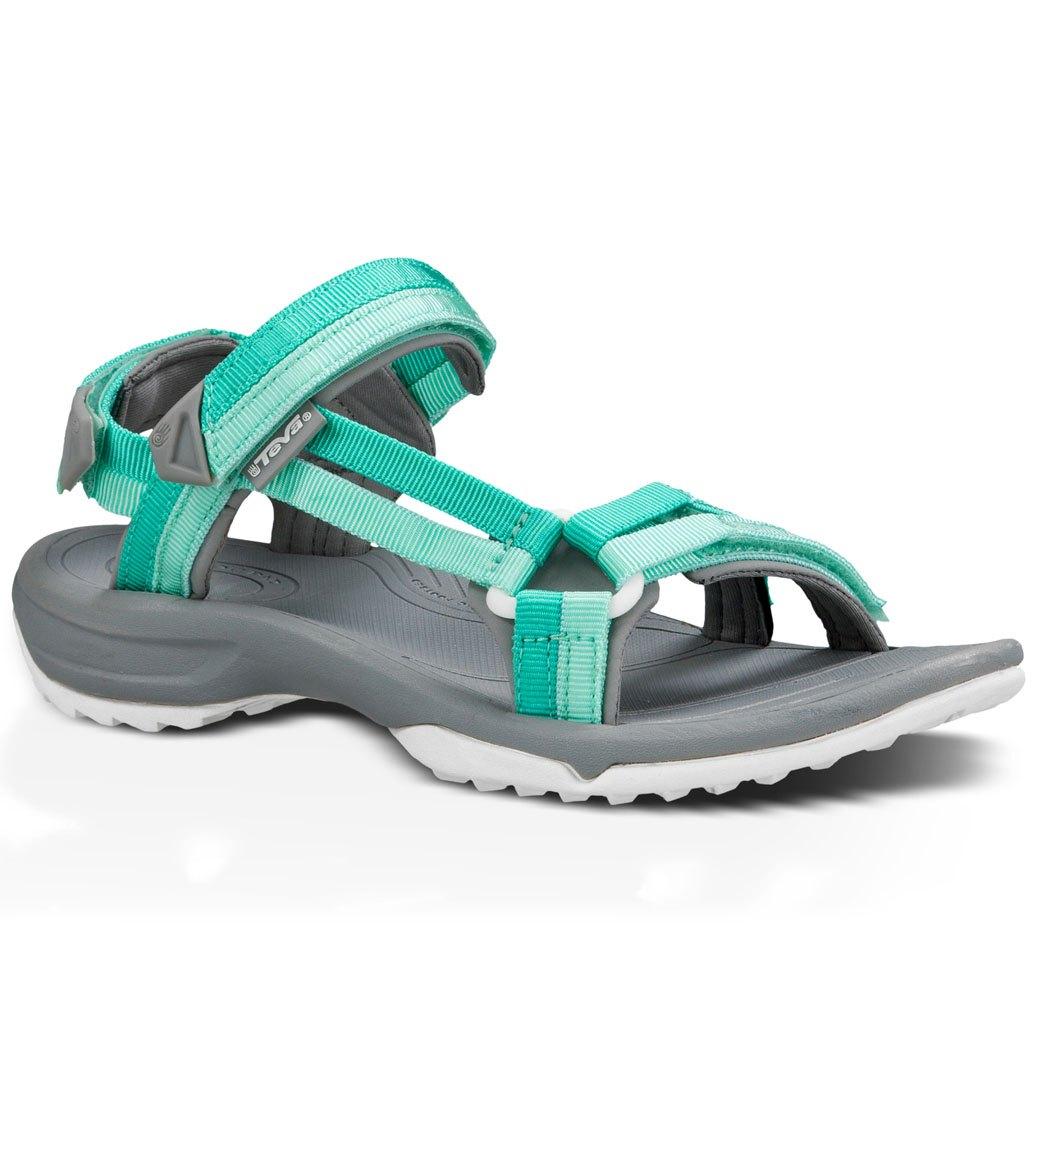 2d911578f Teva Women s Terra FI Lite Sandal at SwimOutlet.com - Free Shipping